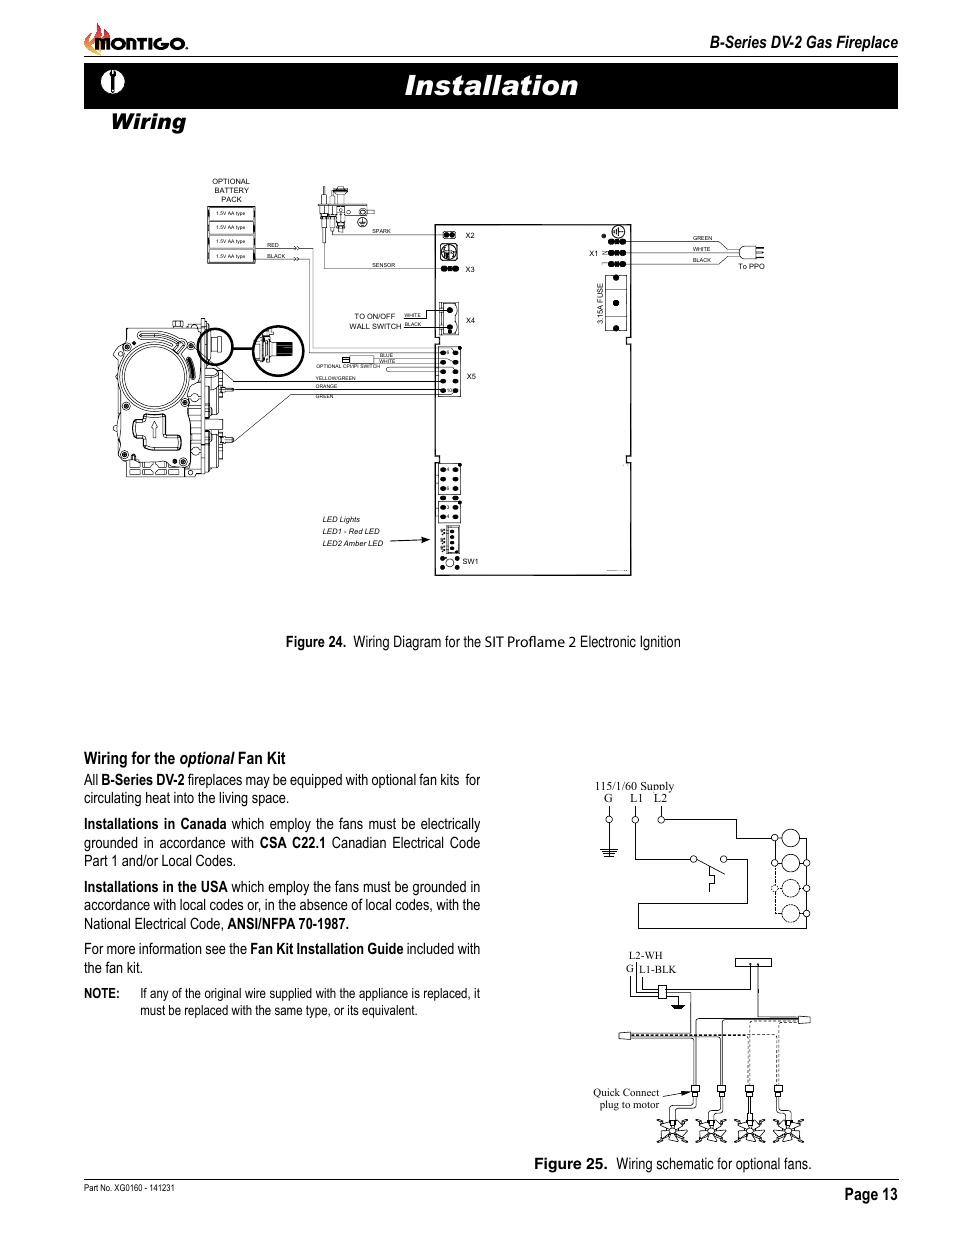 medium resolution of installation wiring page 13 b series dv 2 gas fireplace montigo b34dv user manual page 13 26